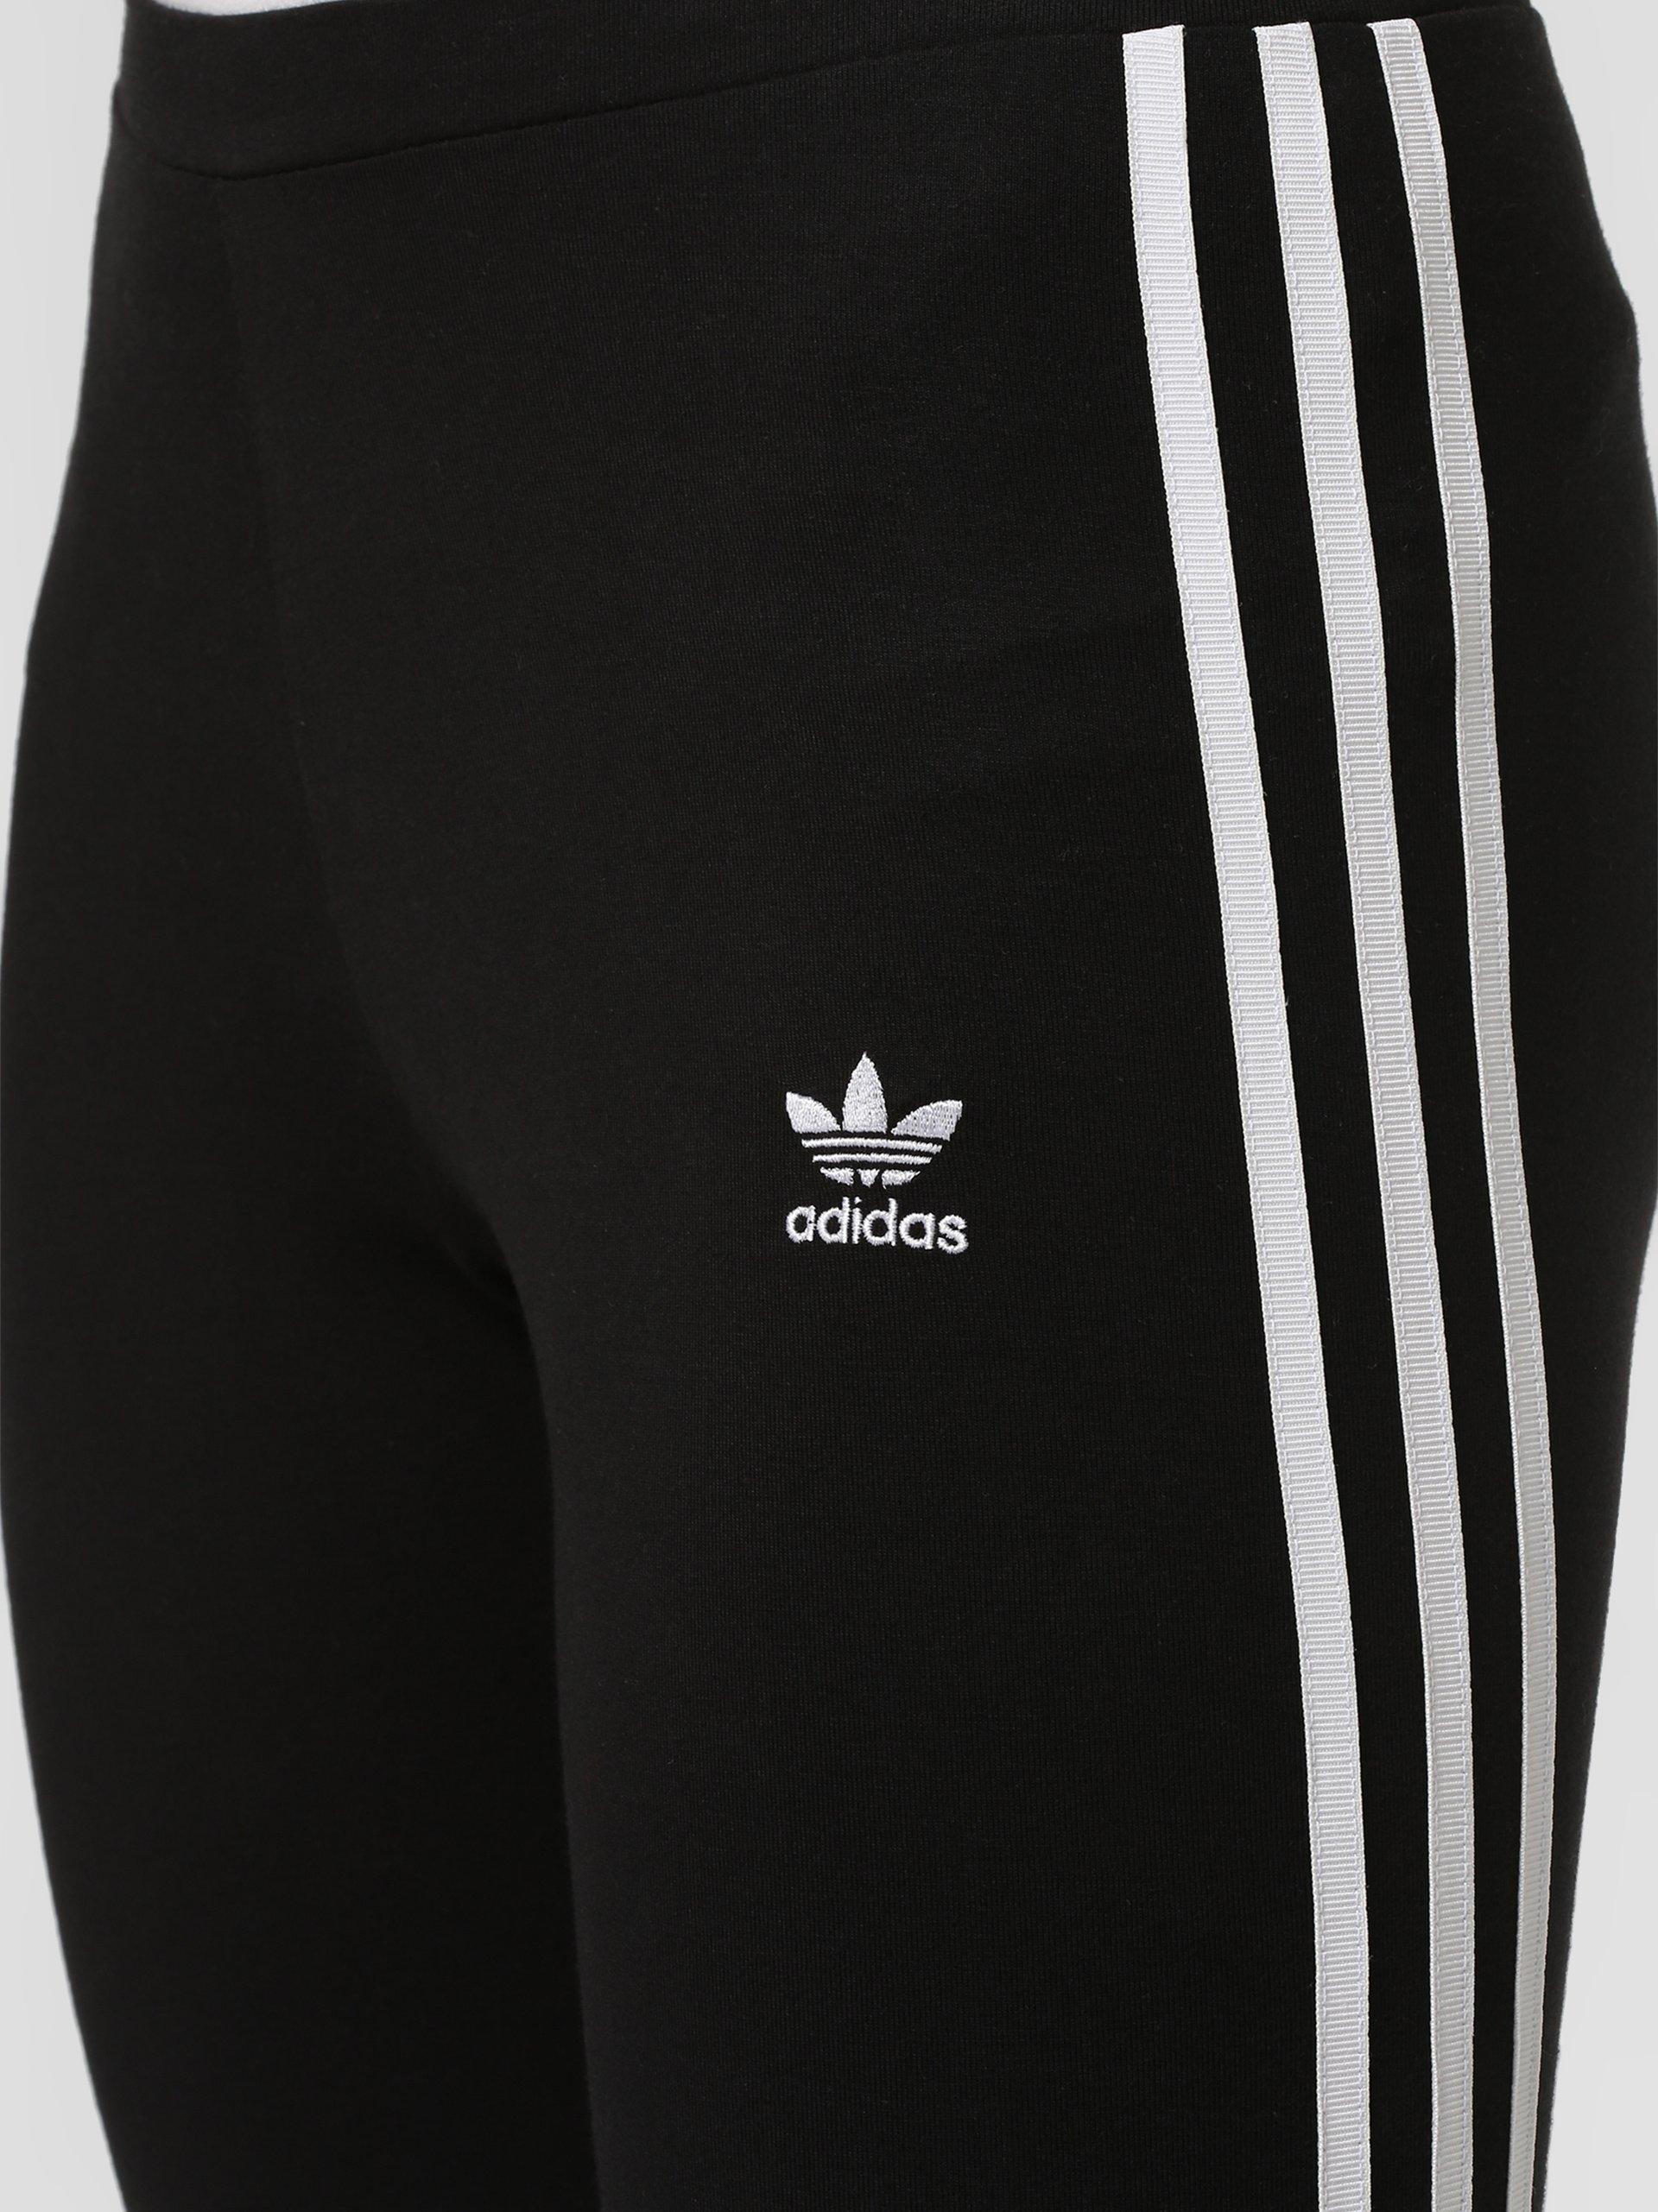 adidas Originals Sportowe legginsy damskie